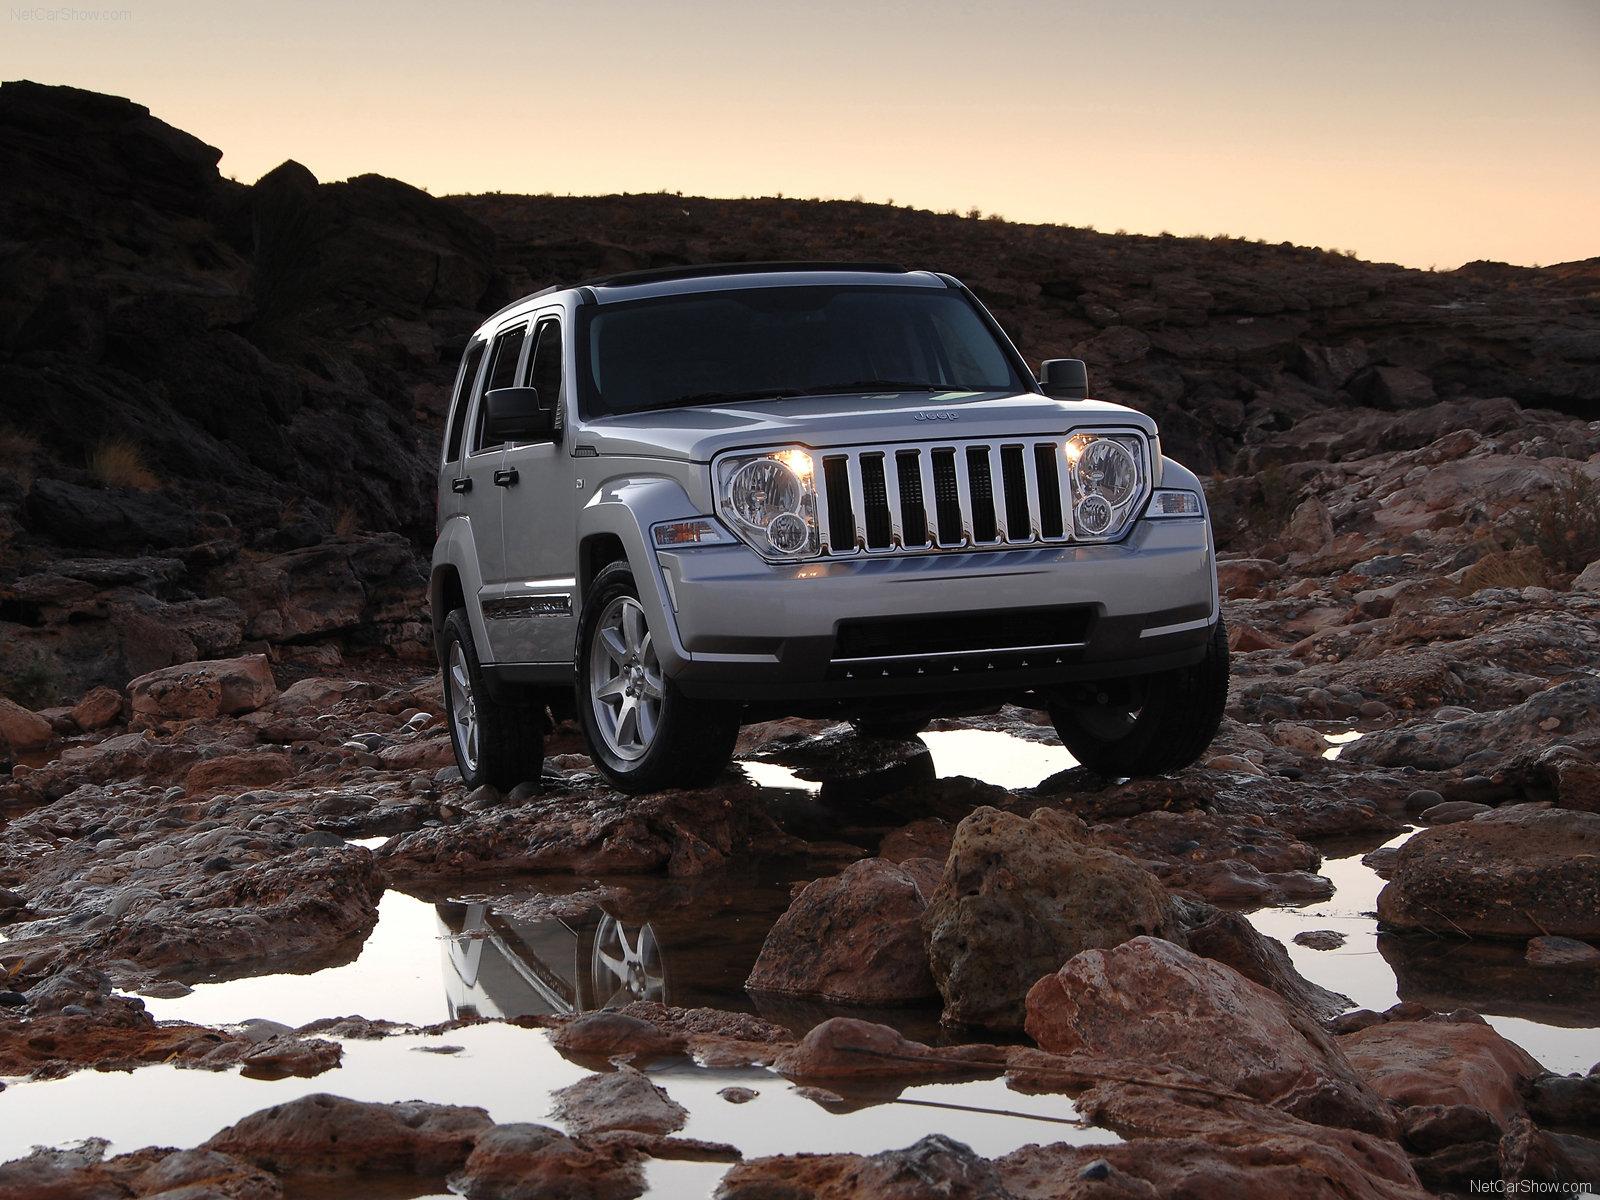 Jeep Liberty 2008-2013 Catalytic Converter 3.7L V6 | Maslak DPF